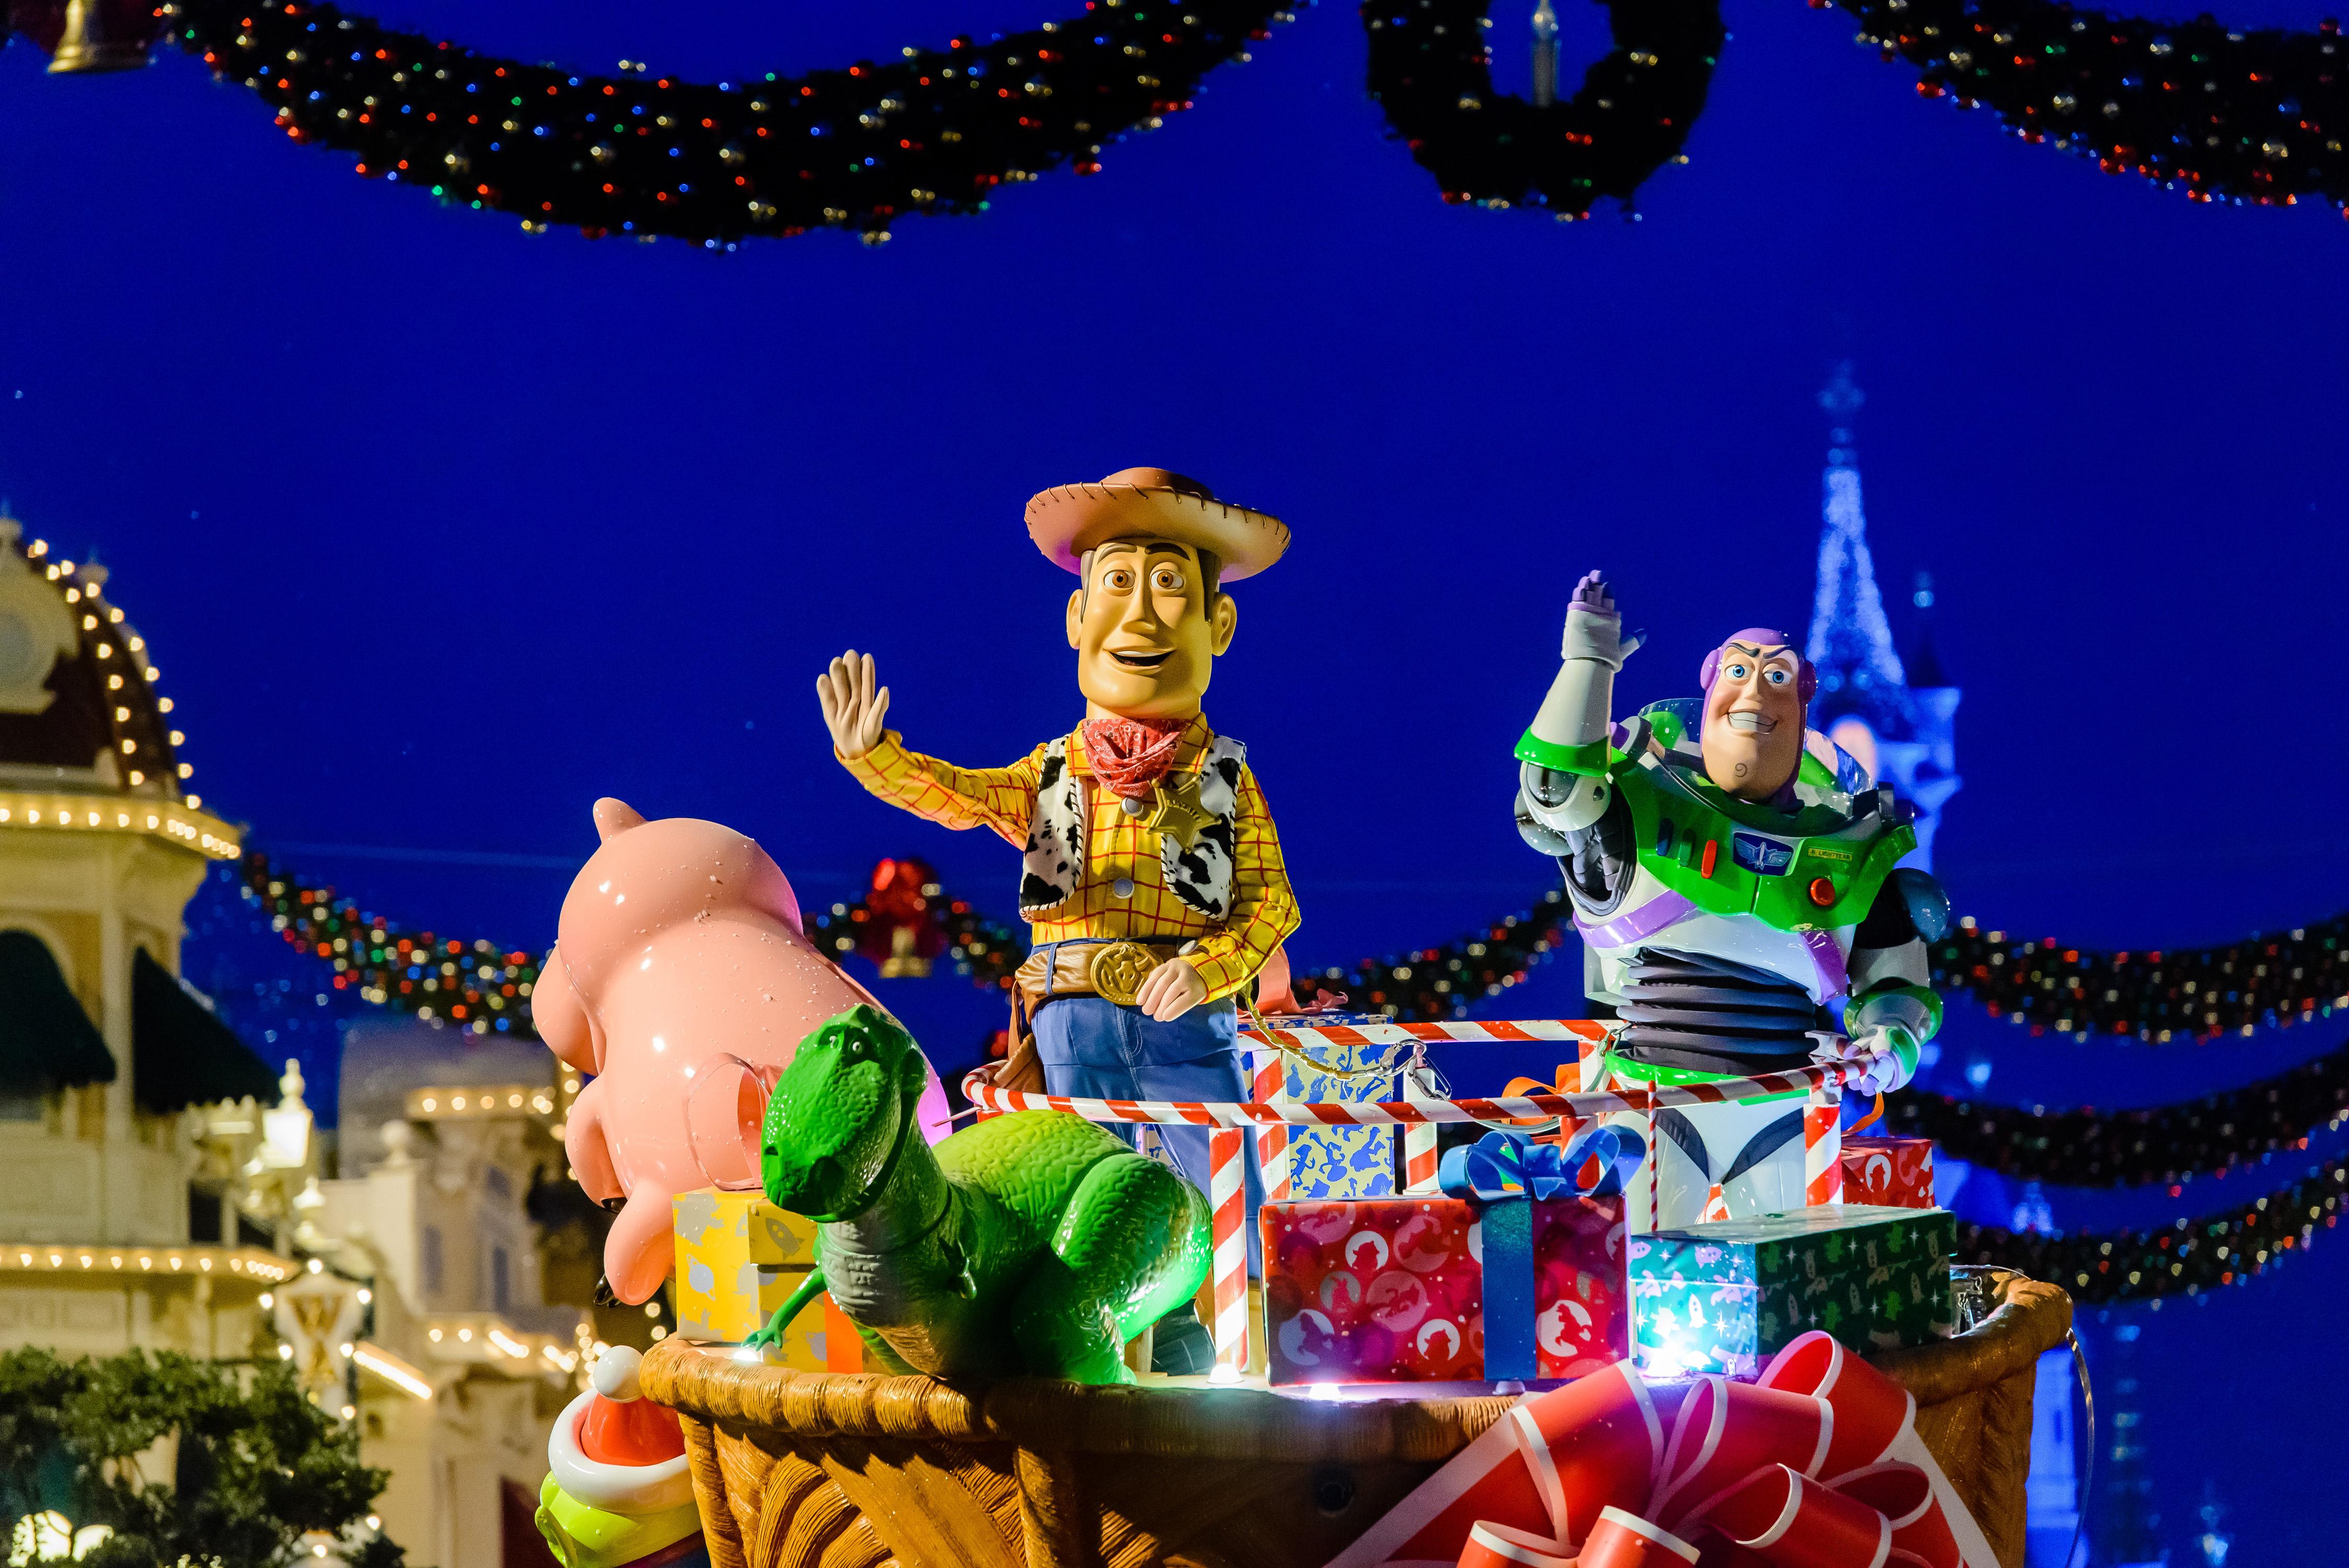 New Year's Eve Parade Disneyland Paris